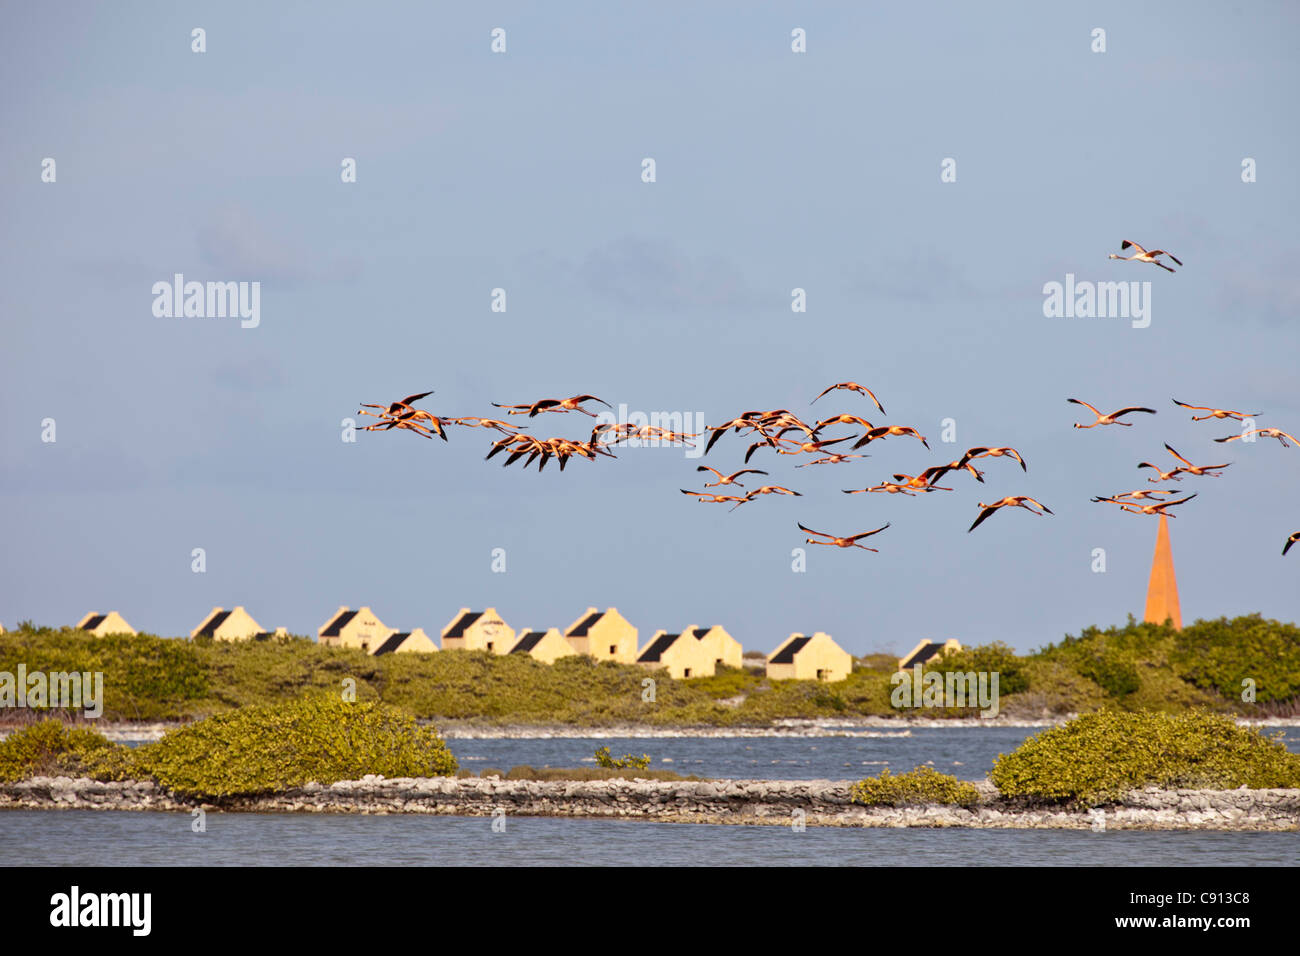 Netherland, Bonaire Island, Dutch Caribbean, Kralendijk, Greater Flamingos (Phoenicopterus ruber) flying in front - Stock Image